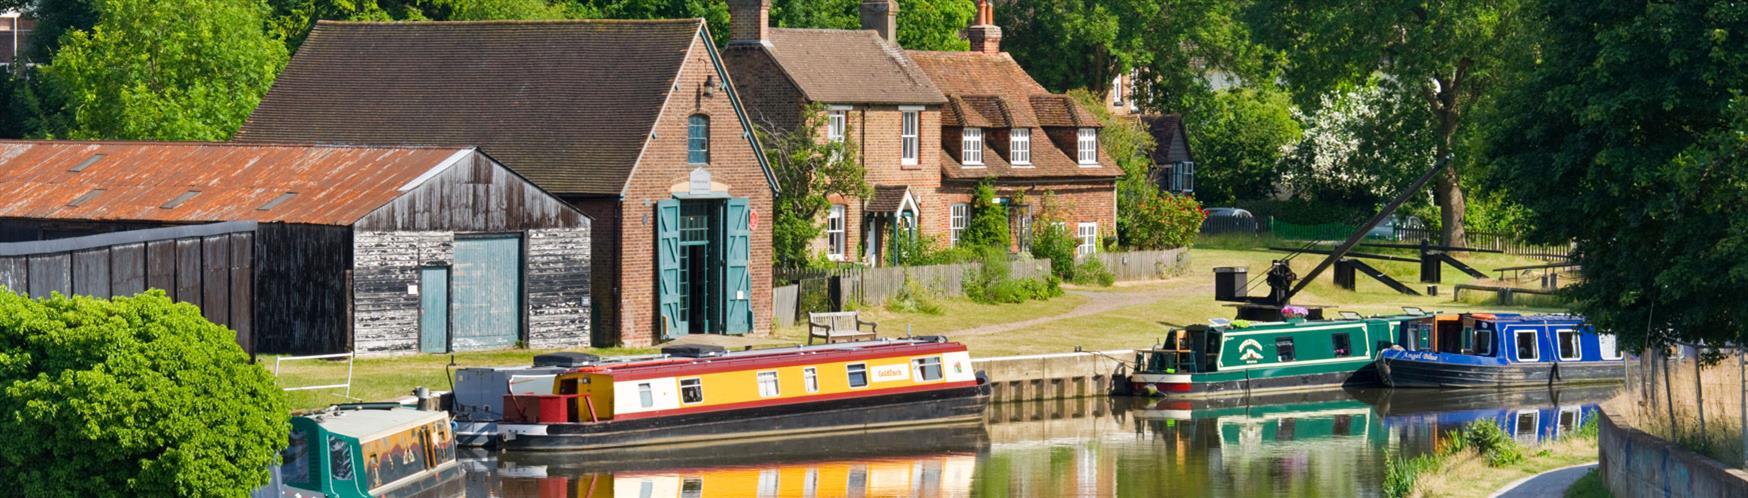 Canals & Rivers in Surrey - Visit Surrey